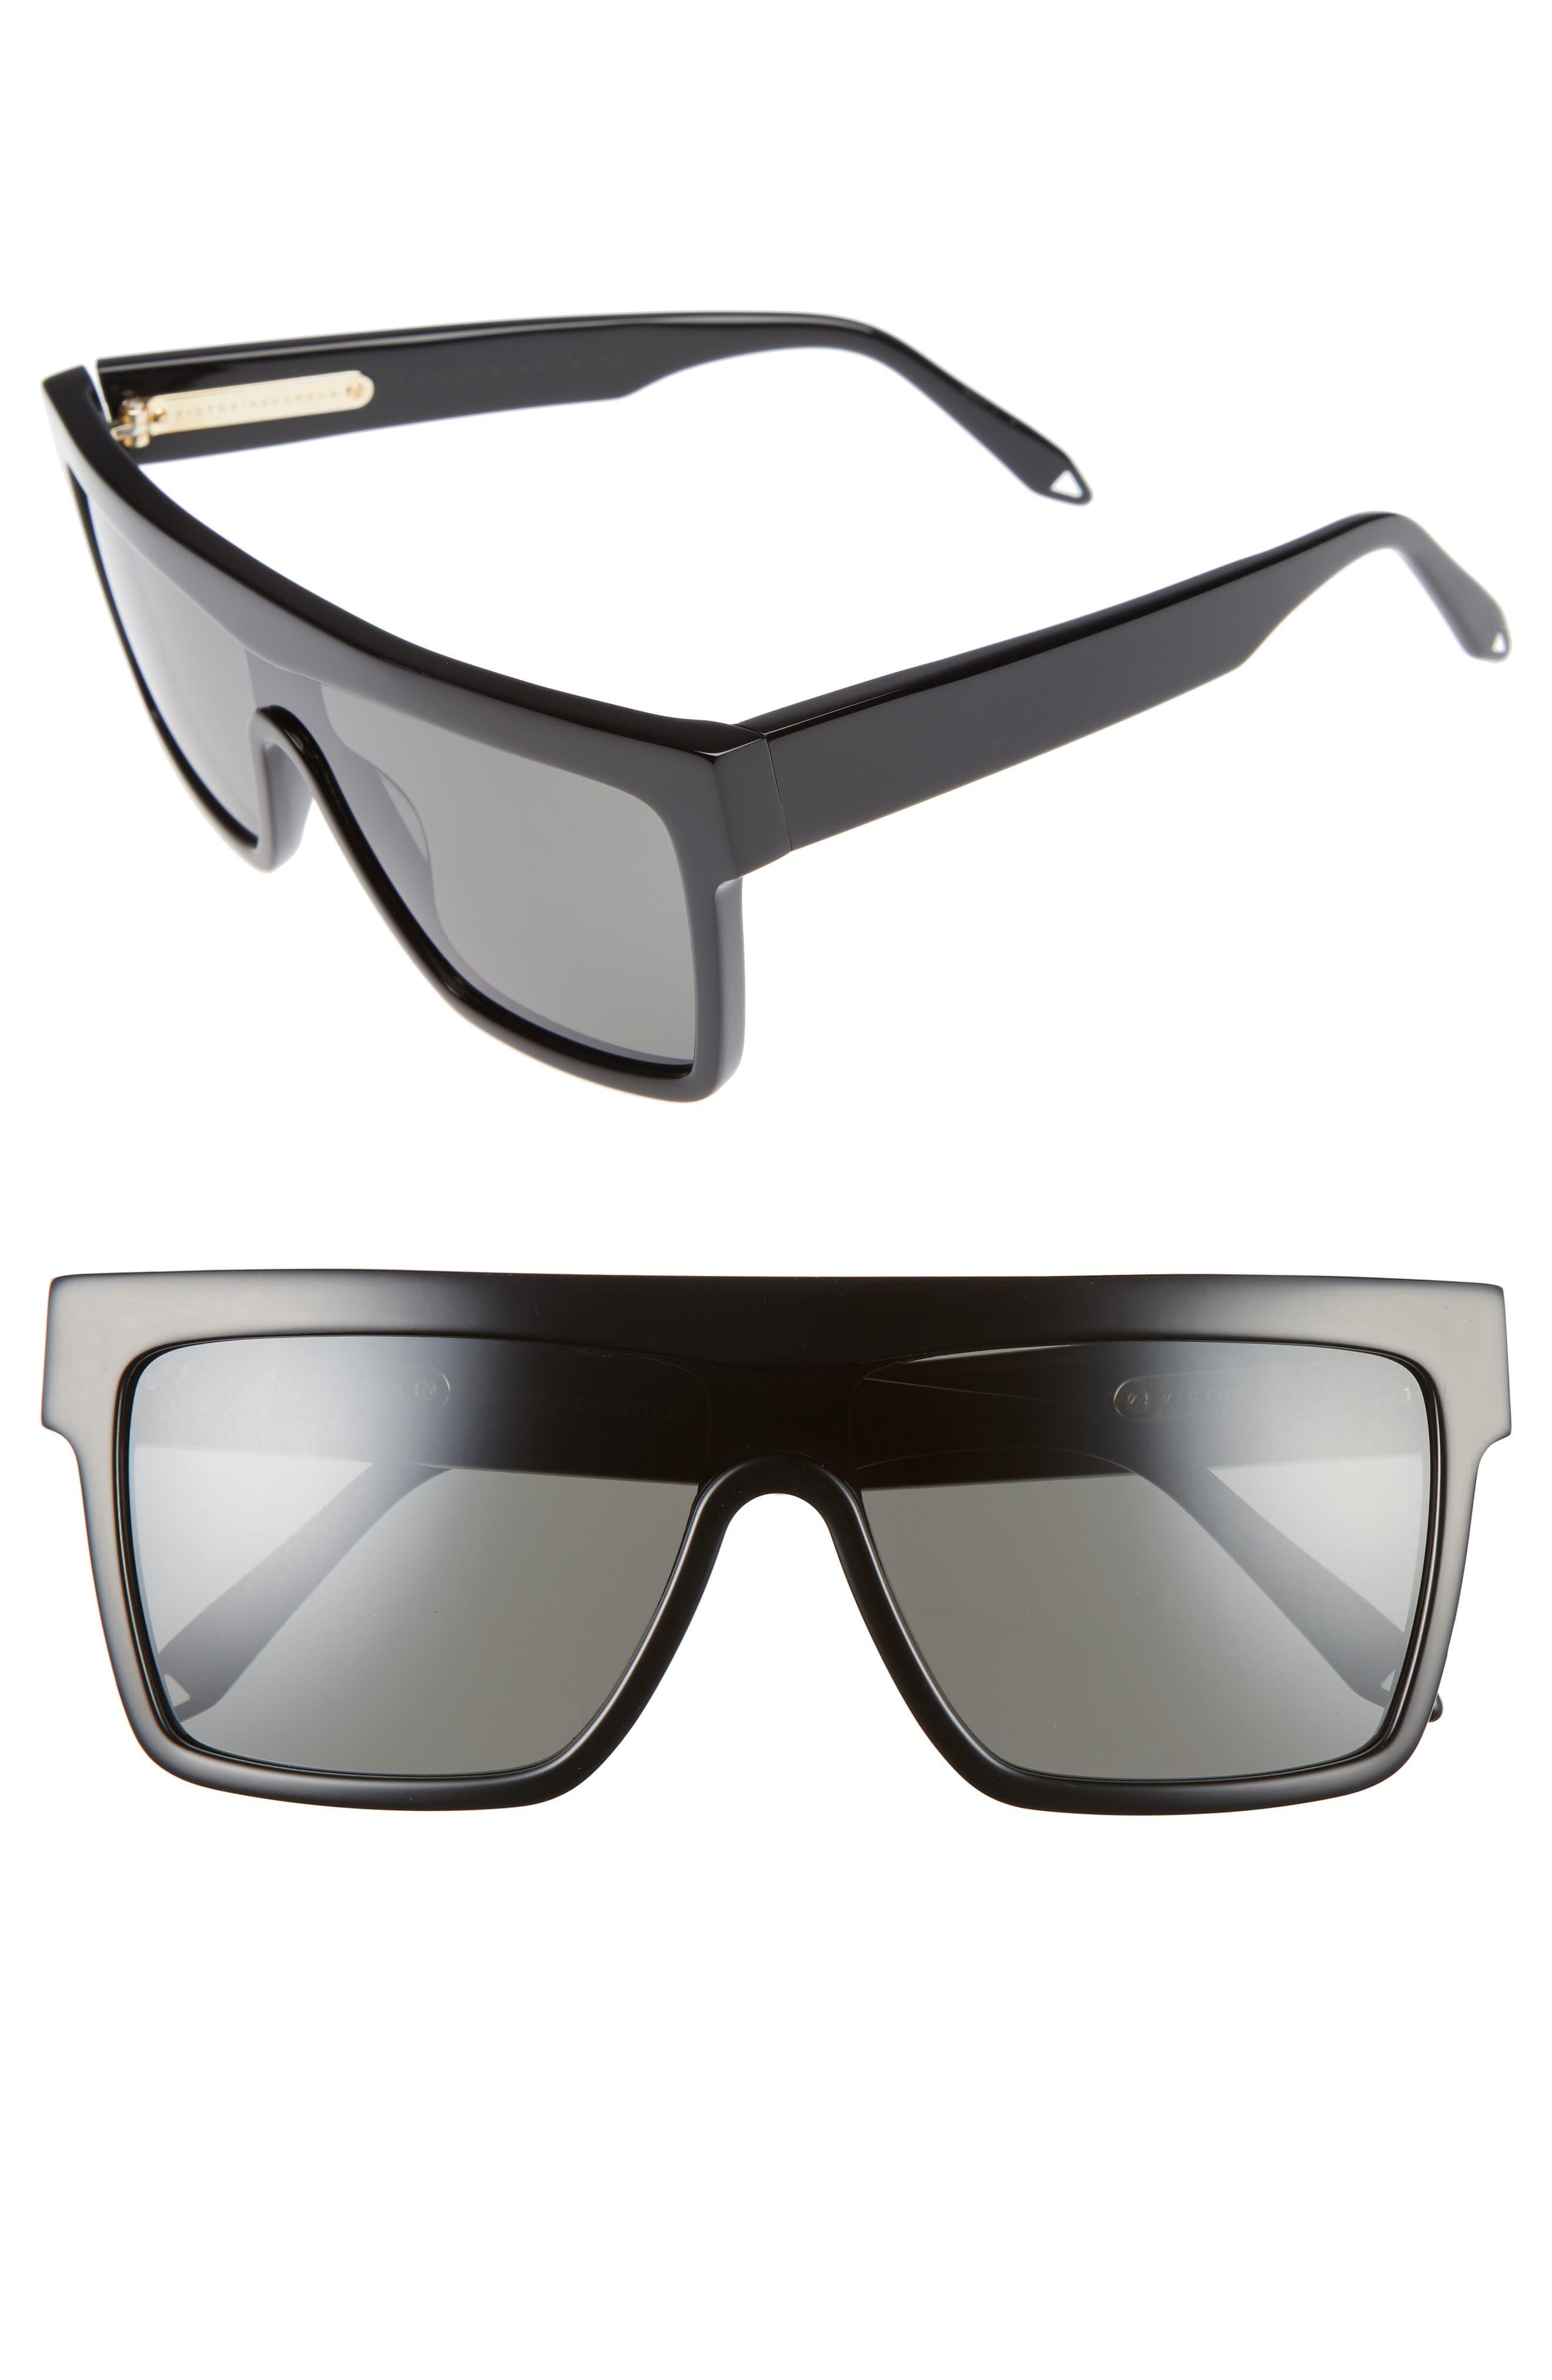 57mm Flat Top Sunglasses,                             Main thumbnail 1, color,                             001